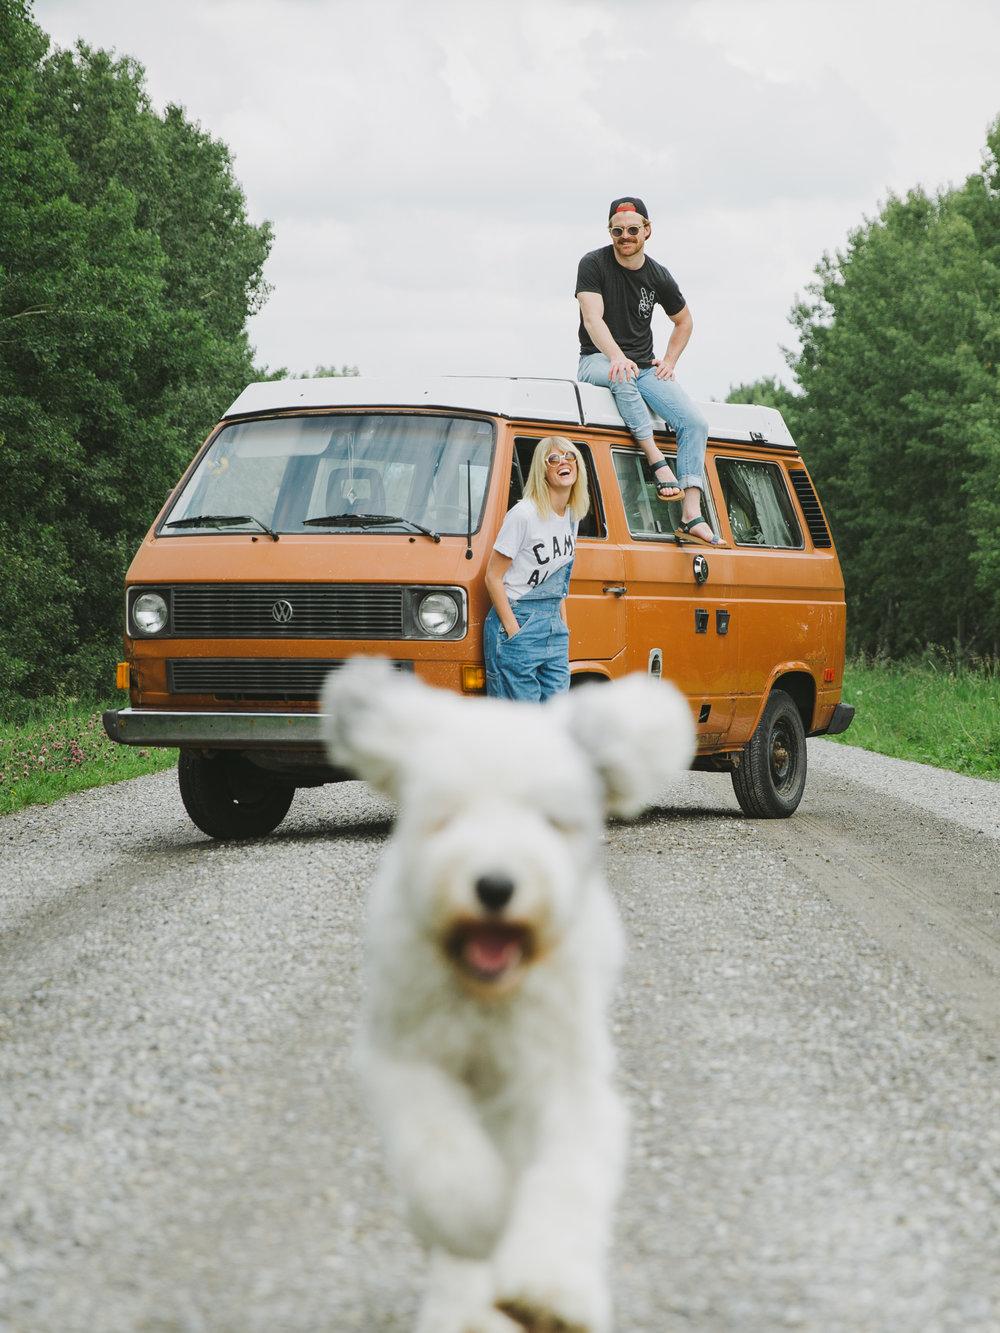 MikeSeehagel-CampBrandGoods-lifestyle-photographer_IMG_8373-2.jpg